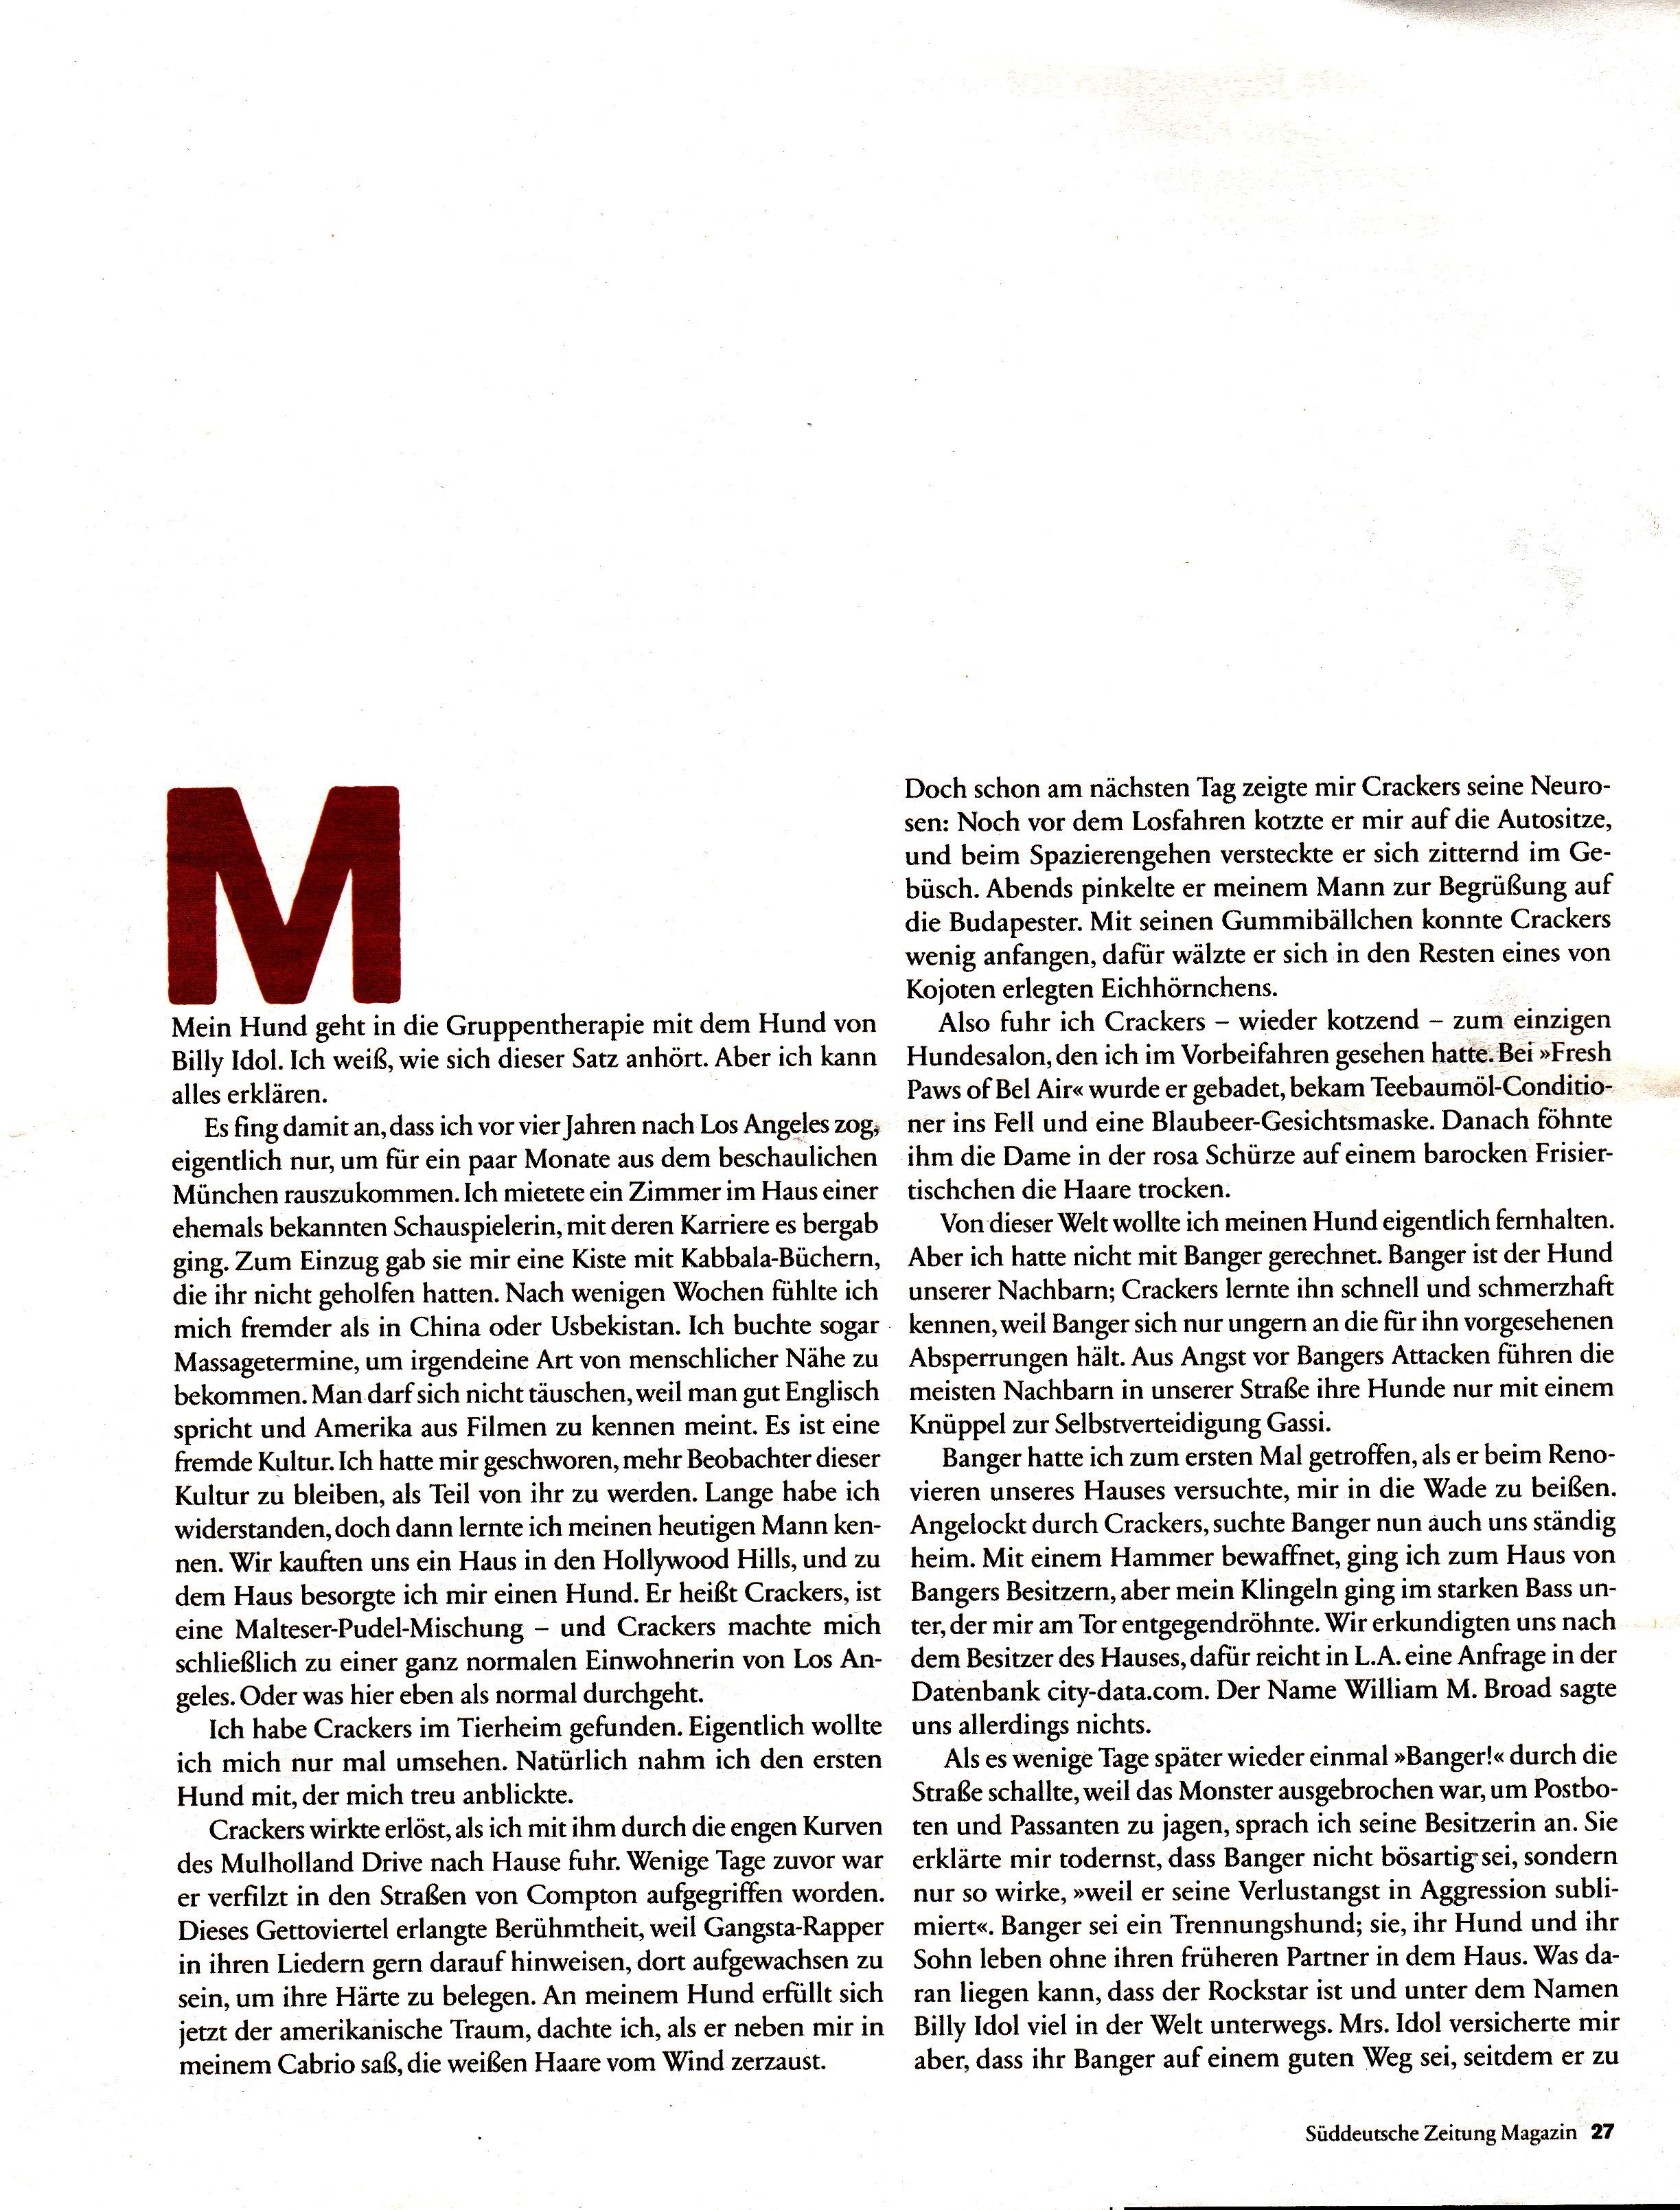 SZ Magazine